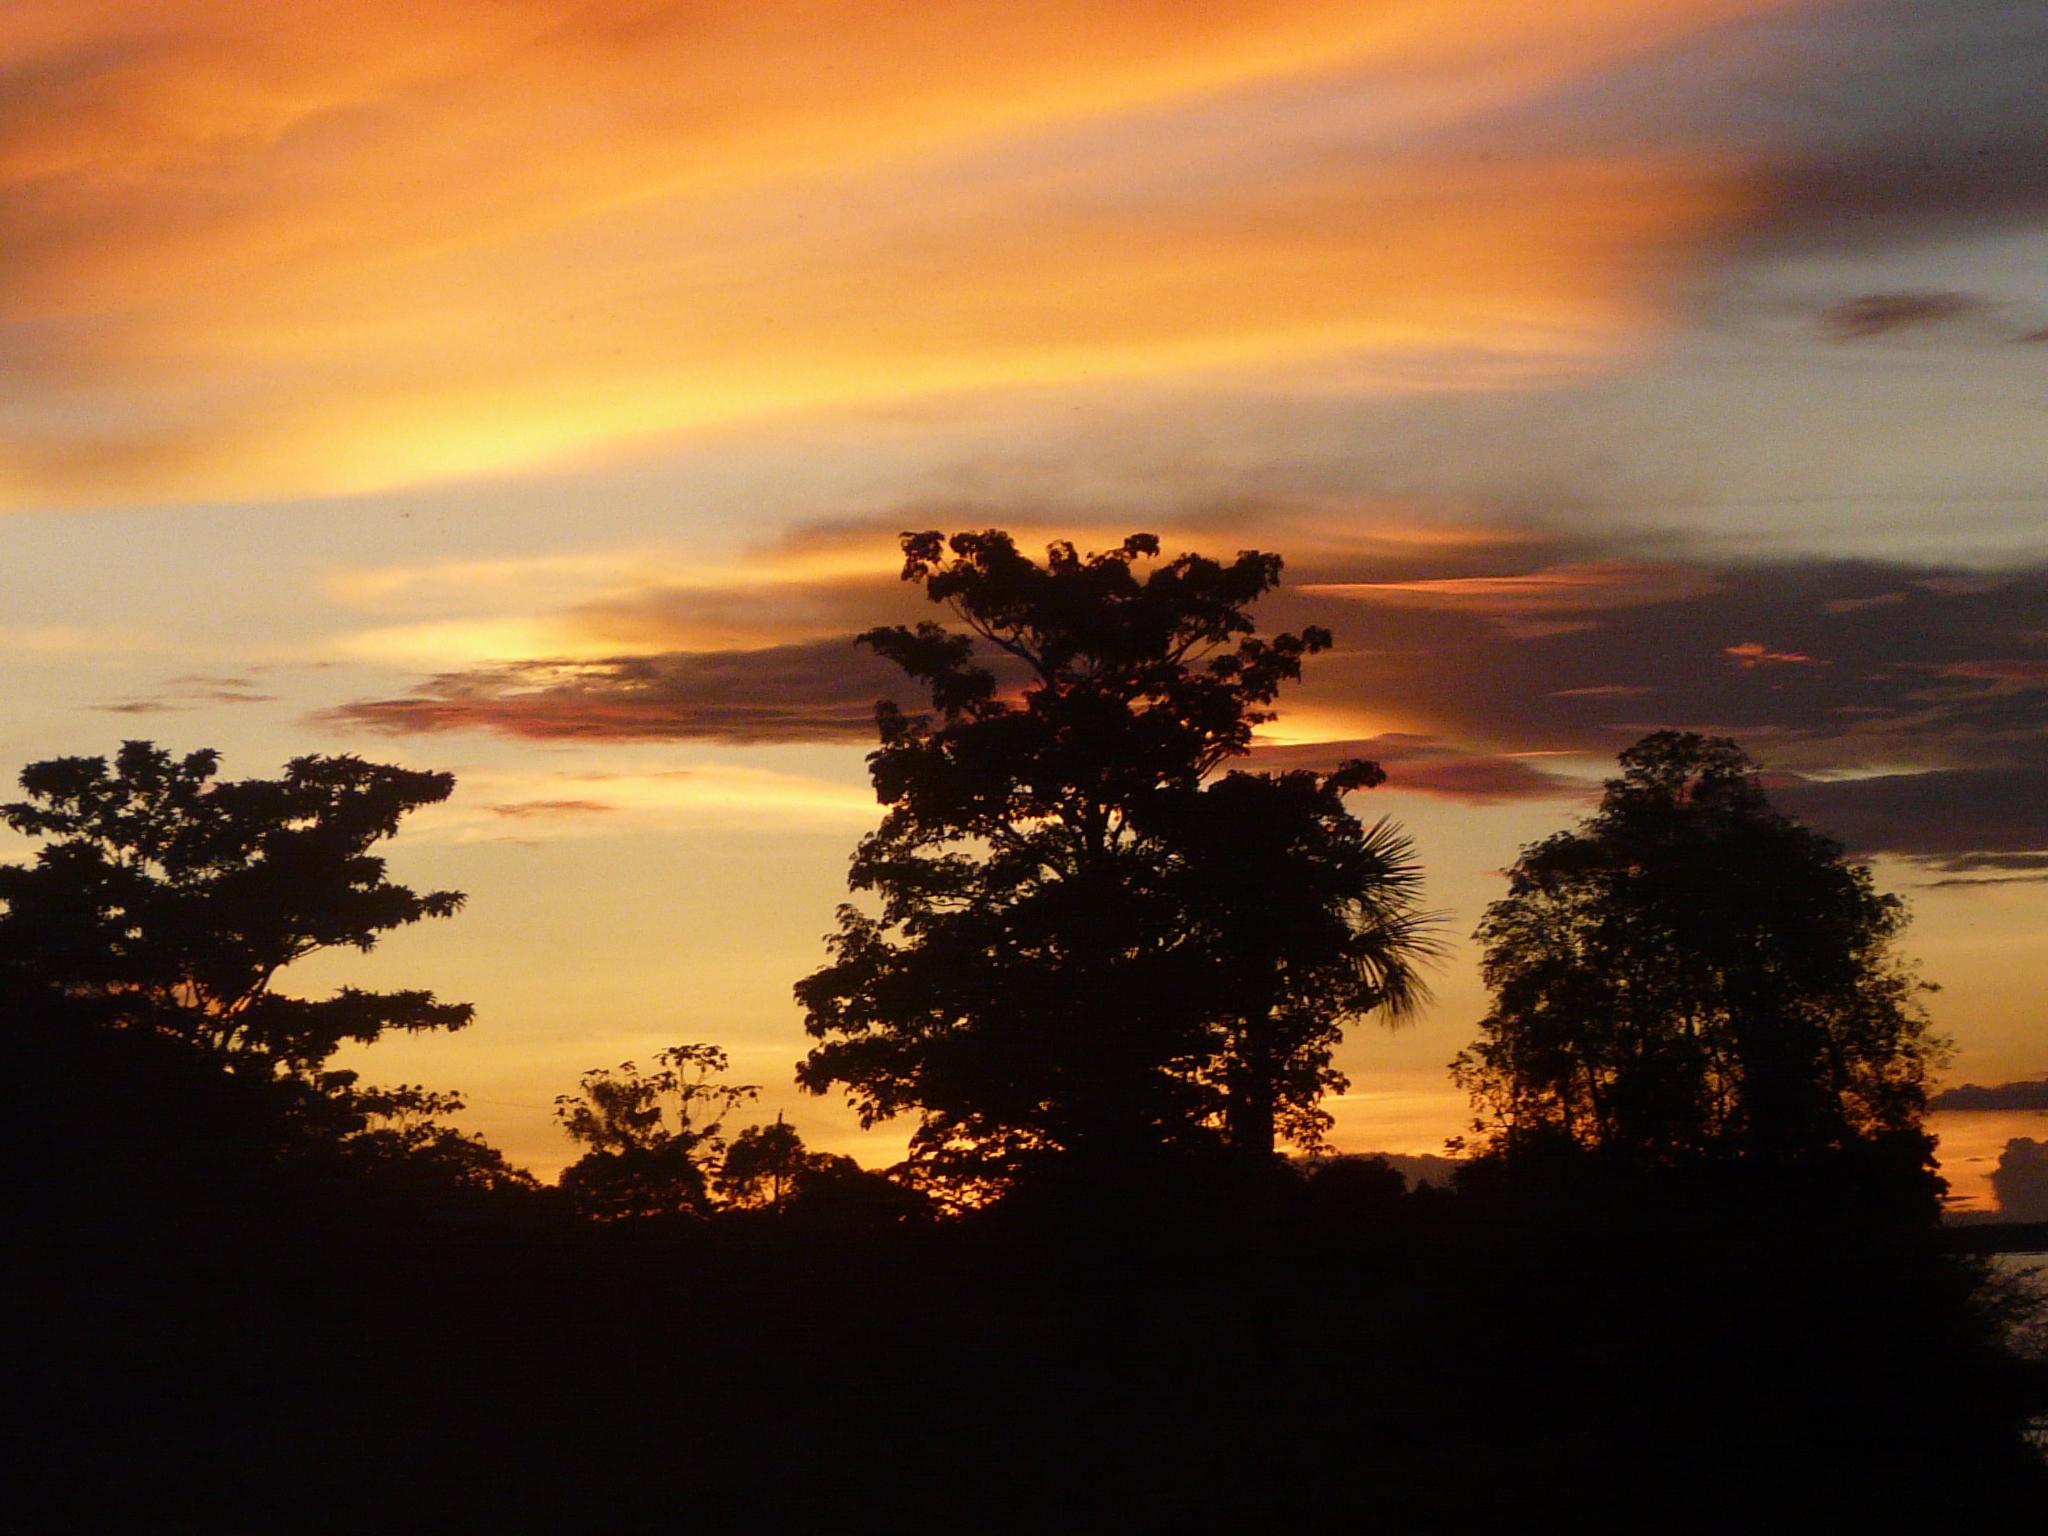 Sunset in Amazonia